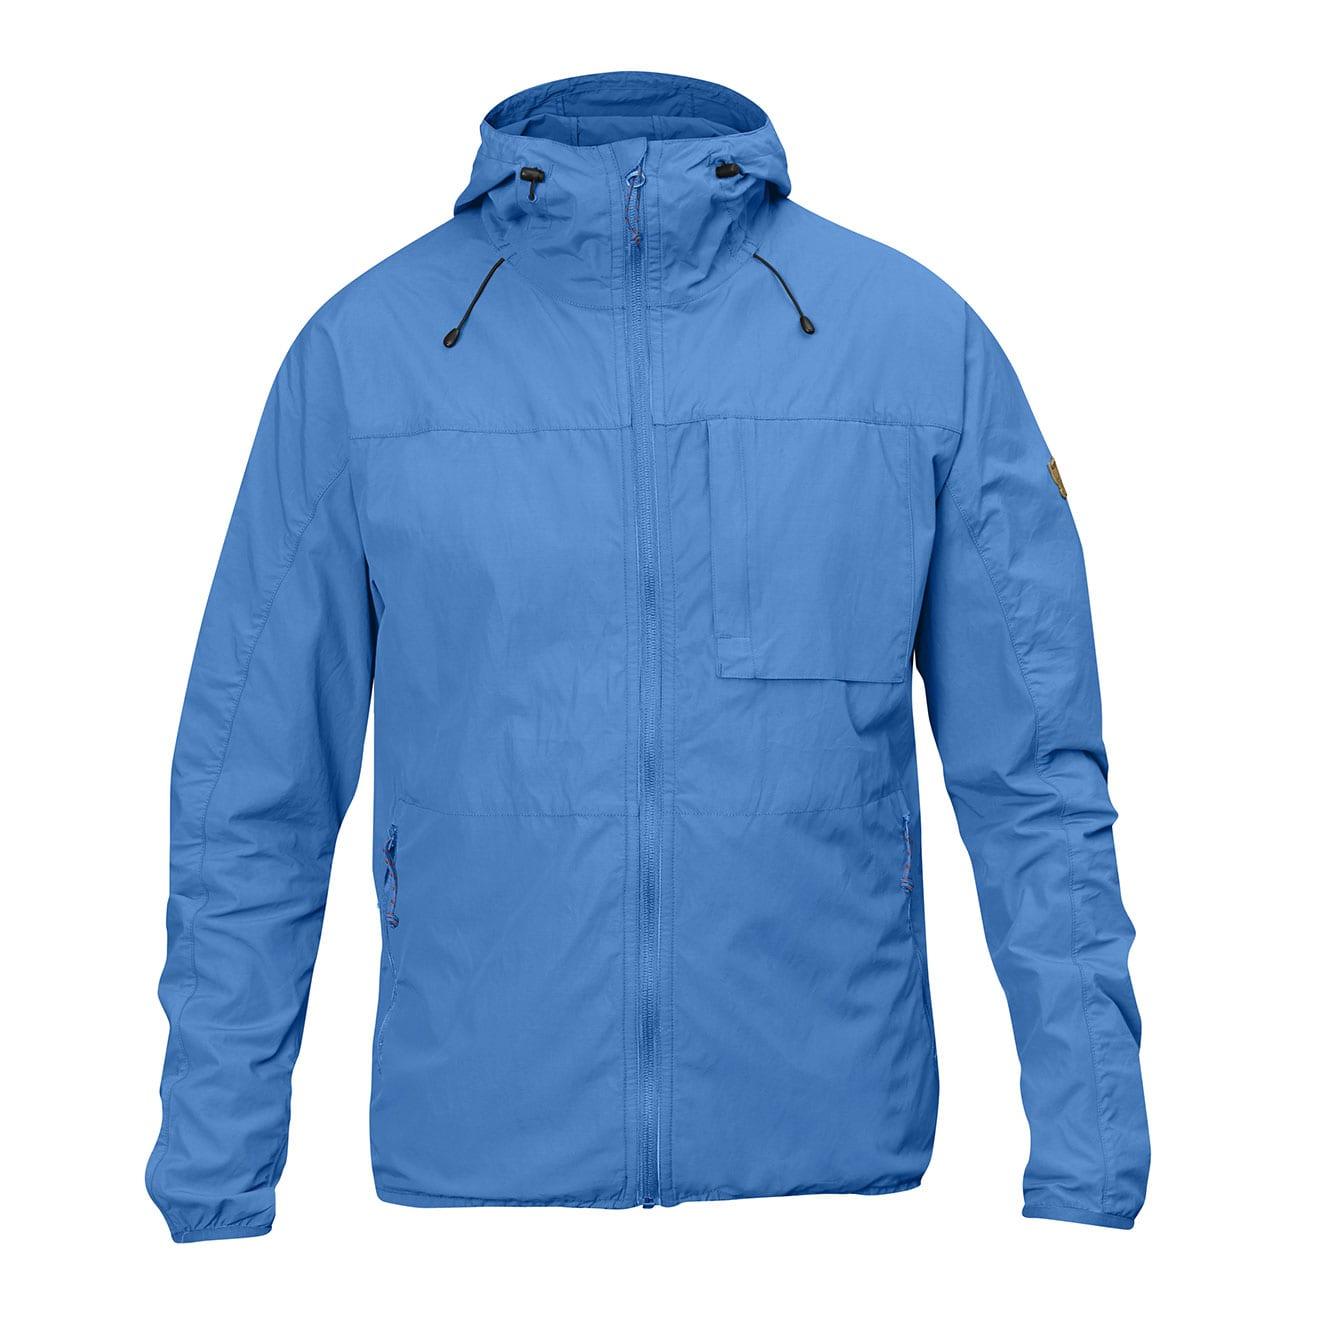 Fjallraven High Coast Wind Jacket The Sporting Lodge